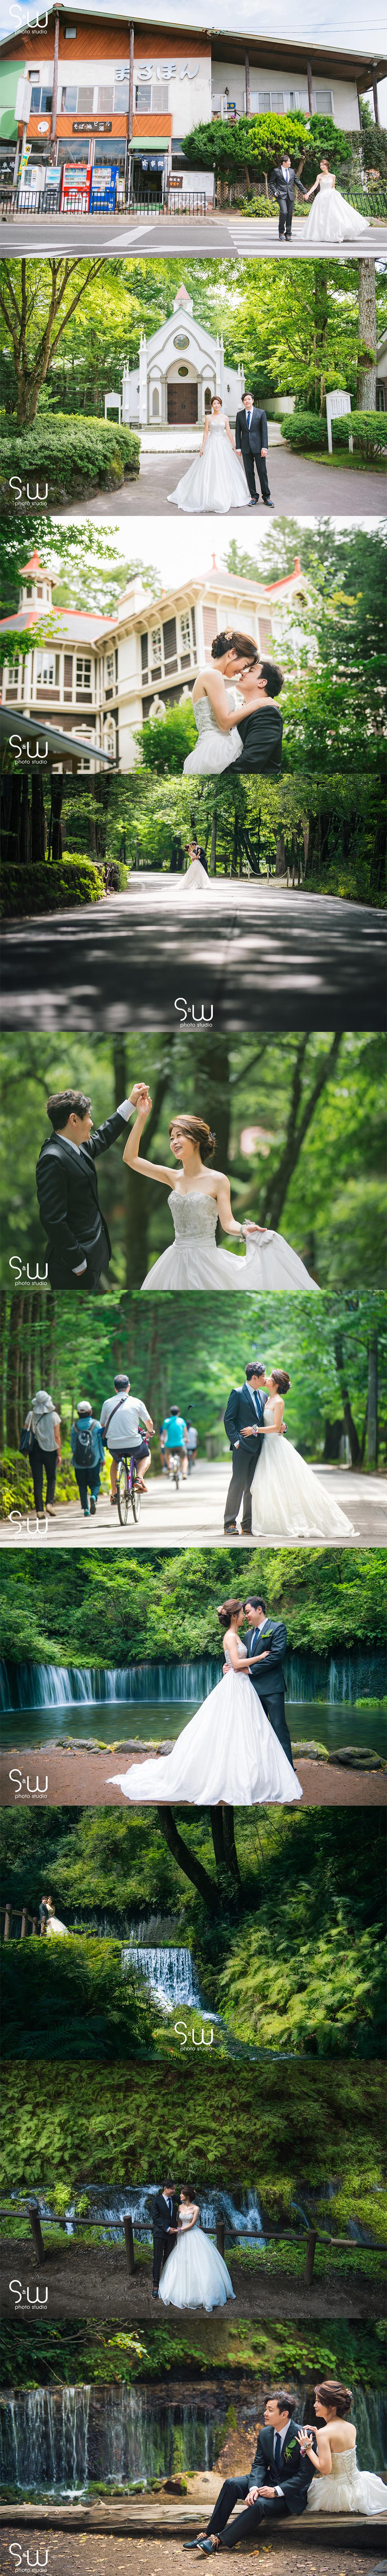 PRE WEDDING | TOYKO JAPAN  (日本婚紗 輕井澤+東京) | sw photo studio 婚禮, 婚攝, 婚紗, 海外婚禮, 海外婚紗, 海島婚禮,峇里島婚禮, 峇里島婚紗, 台灣婚禮, 婚攝推薦